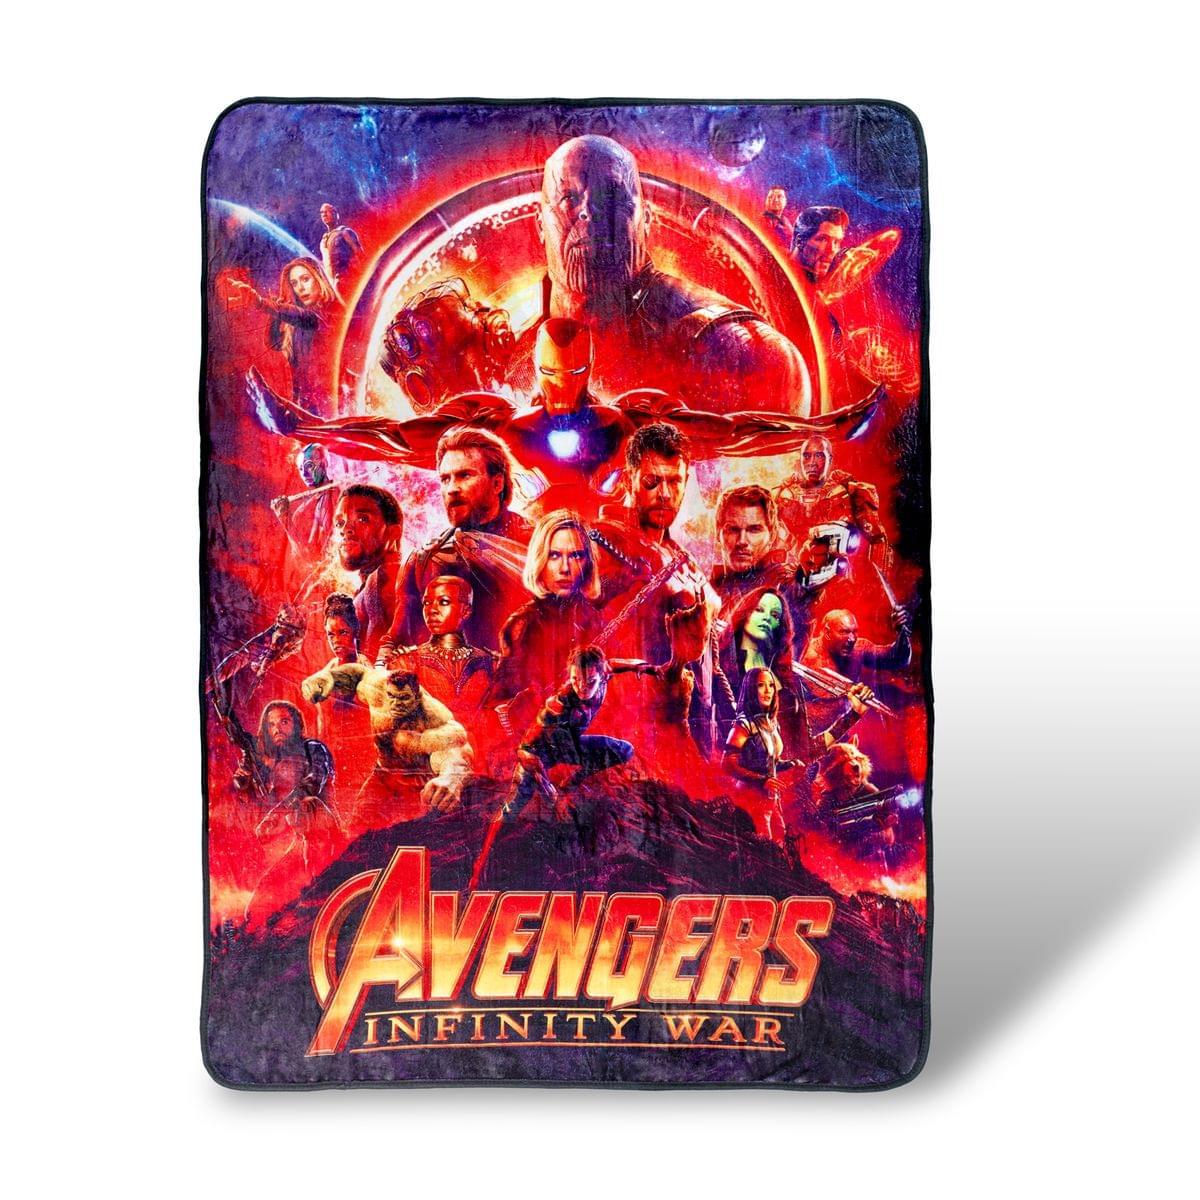 Avengers Infinity War Lightweight Fleece Throw Blanket| 45x60 Inches